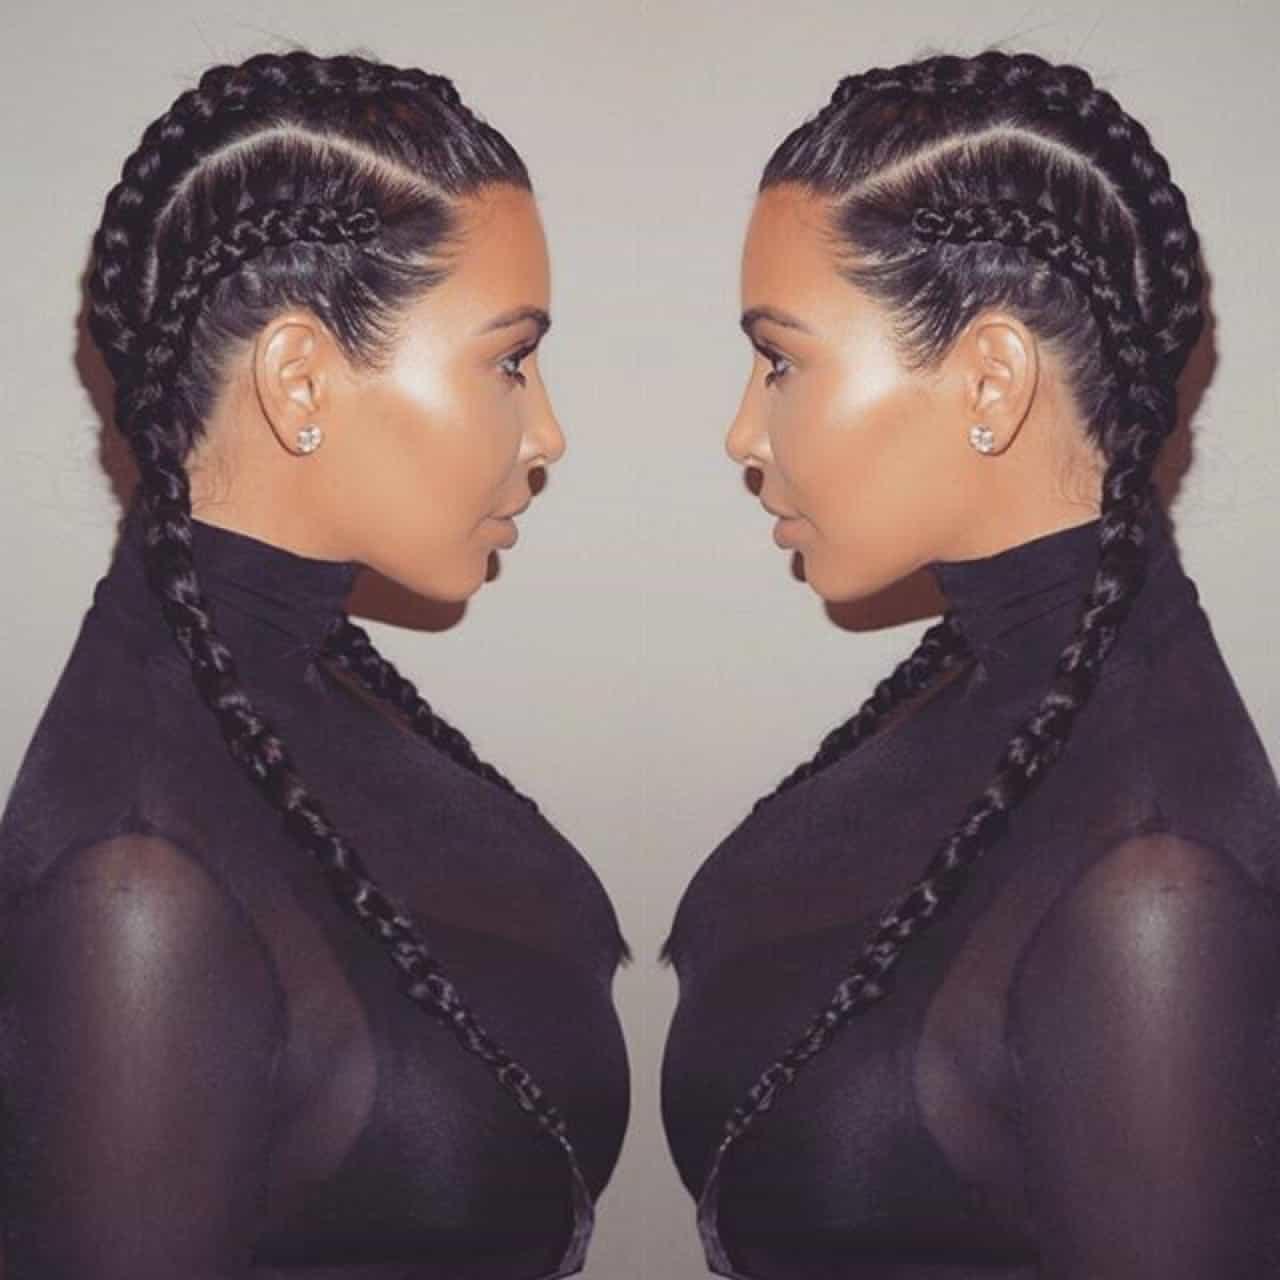 Pleasant Kim Kardashian Braided Hairstyle With Scarf Braids Short Hairstyles Gunalazisus